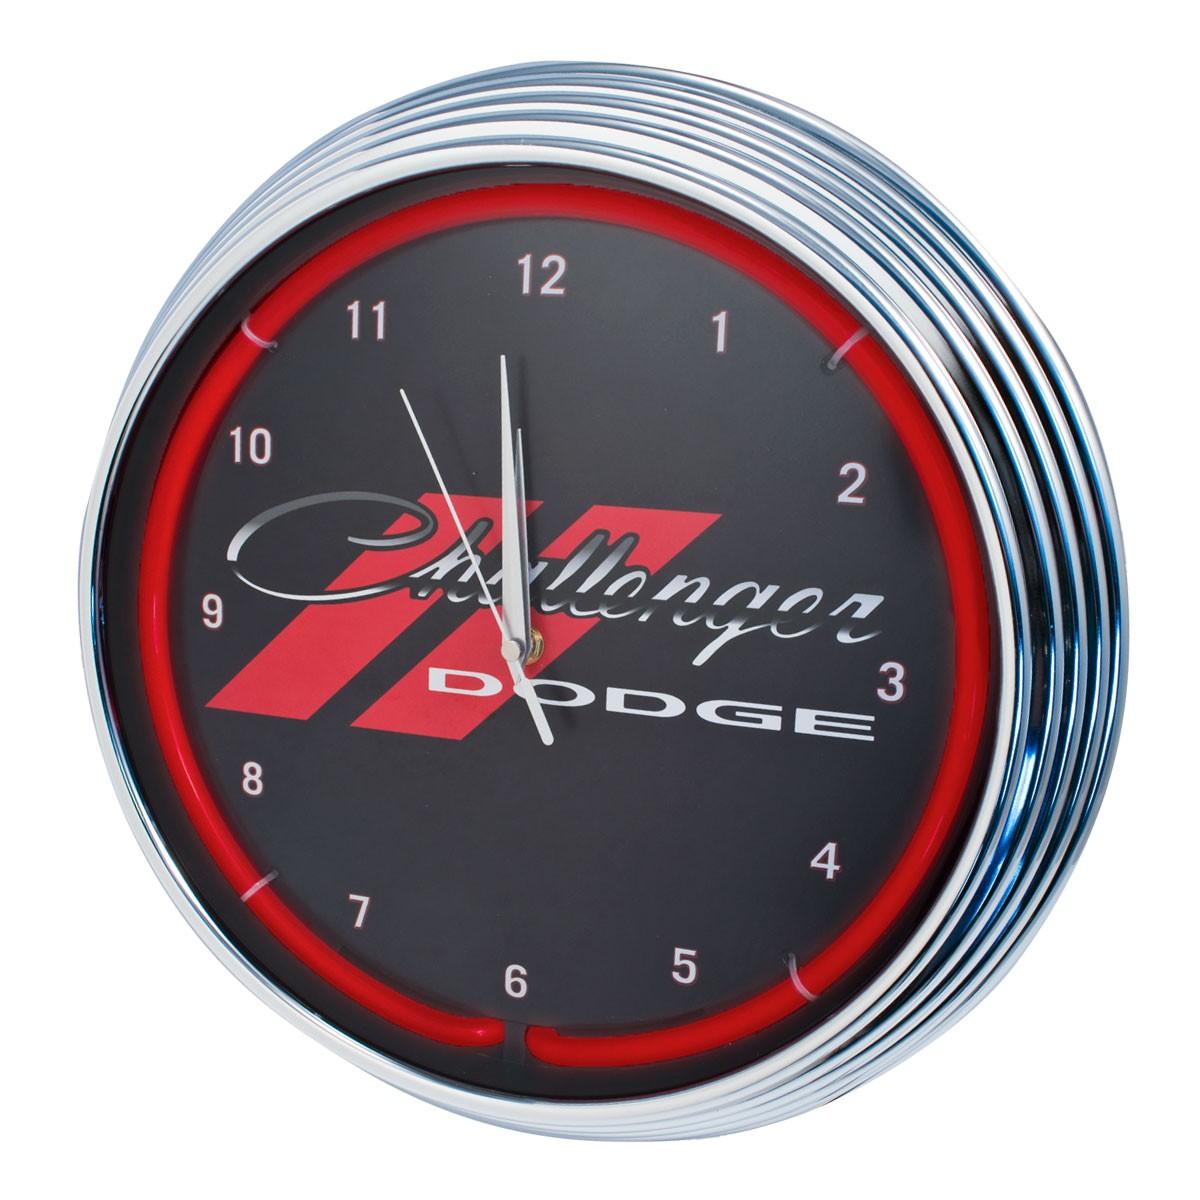 Dodge Challenger Red Illuminated Light Up Neon Clock w/ Chrome Trim